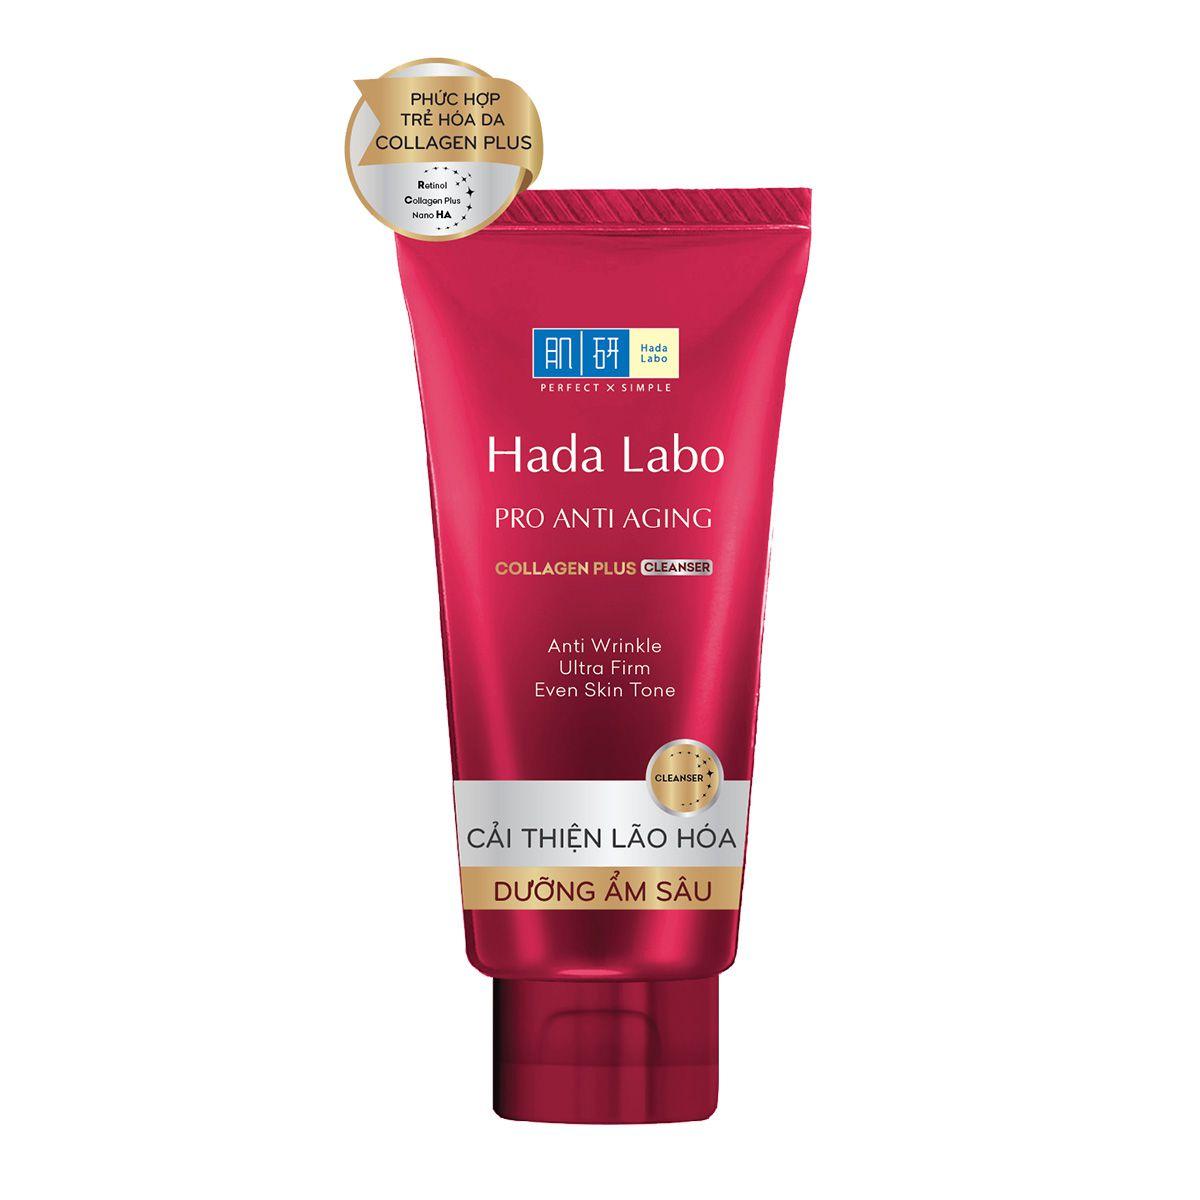 Sữa rửa mặt Hada Labo Nhật Pro Anti Aging Collagen Plus Cleanser 1